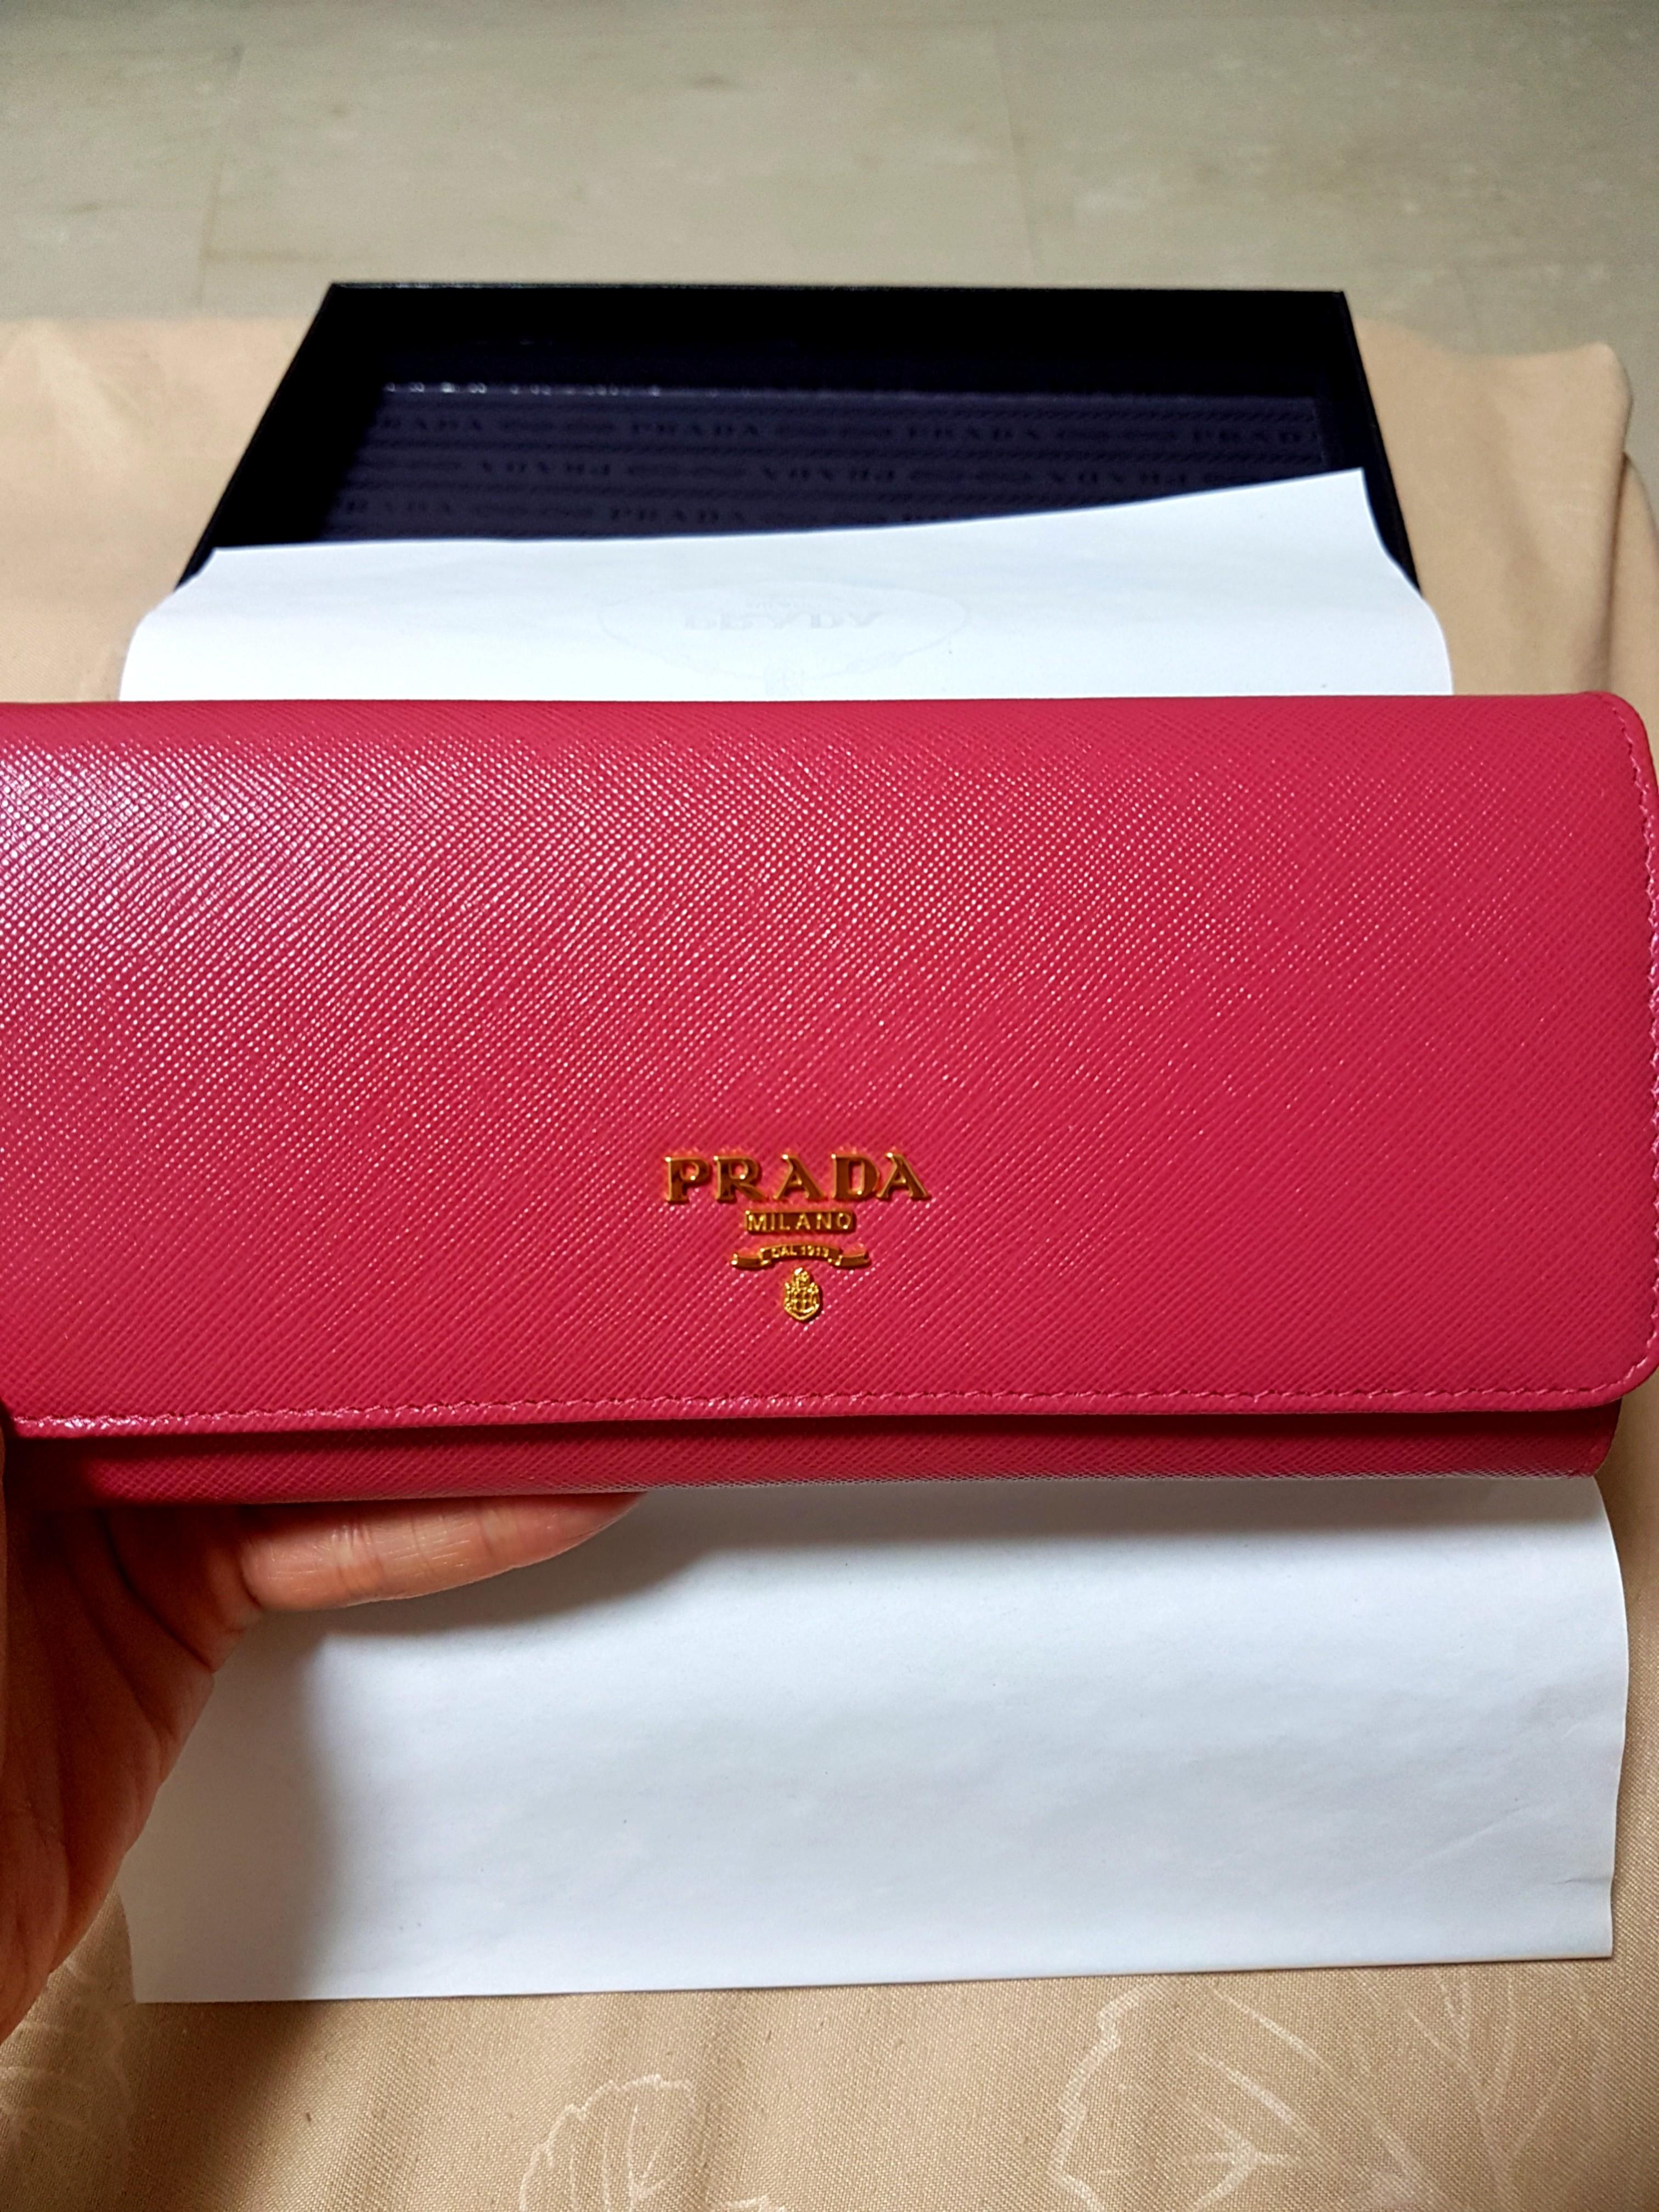 93488ce0e3d324 Prada Saffiano Long Wallet Peony, Women's Fashion, Bags & Wallets ...